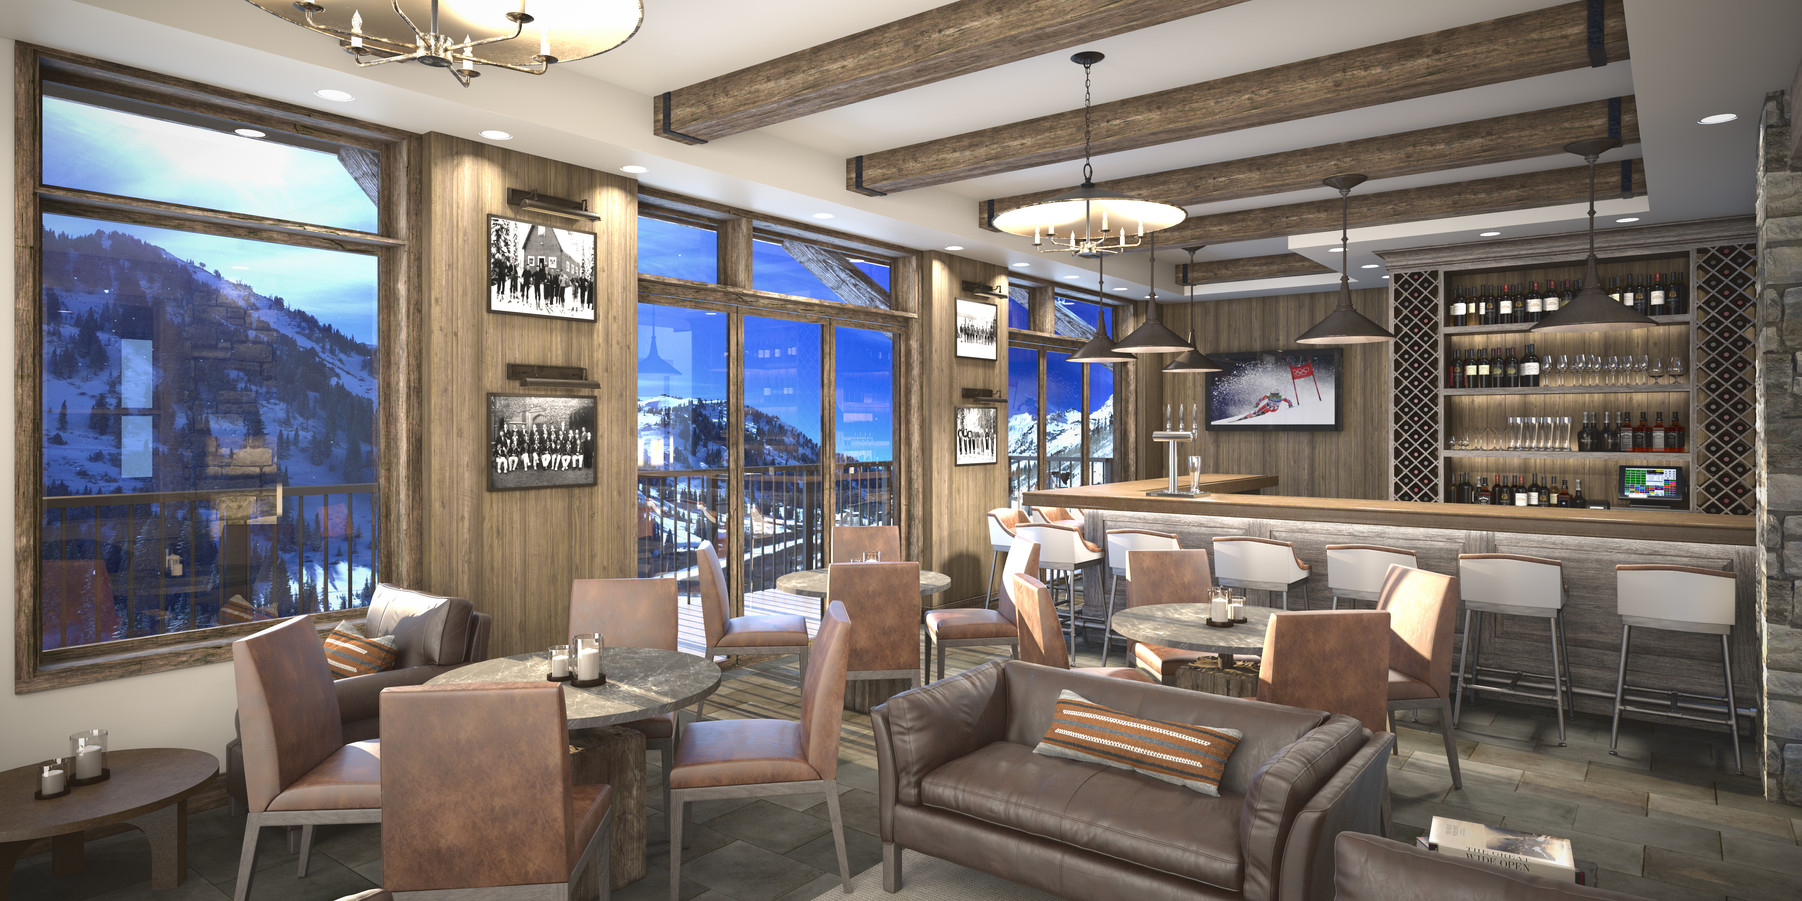 The Snowpine Lodge Bar